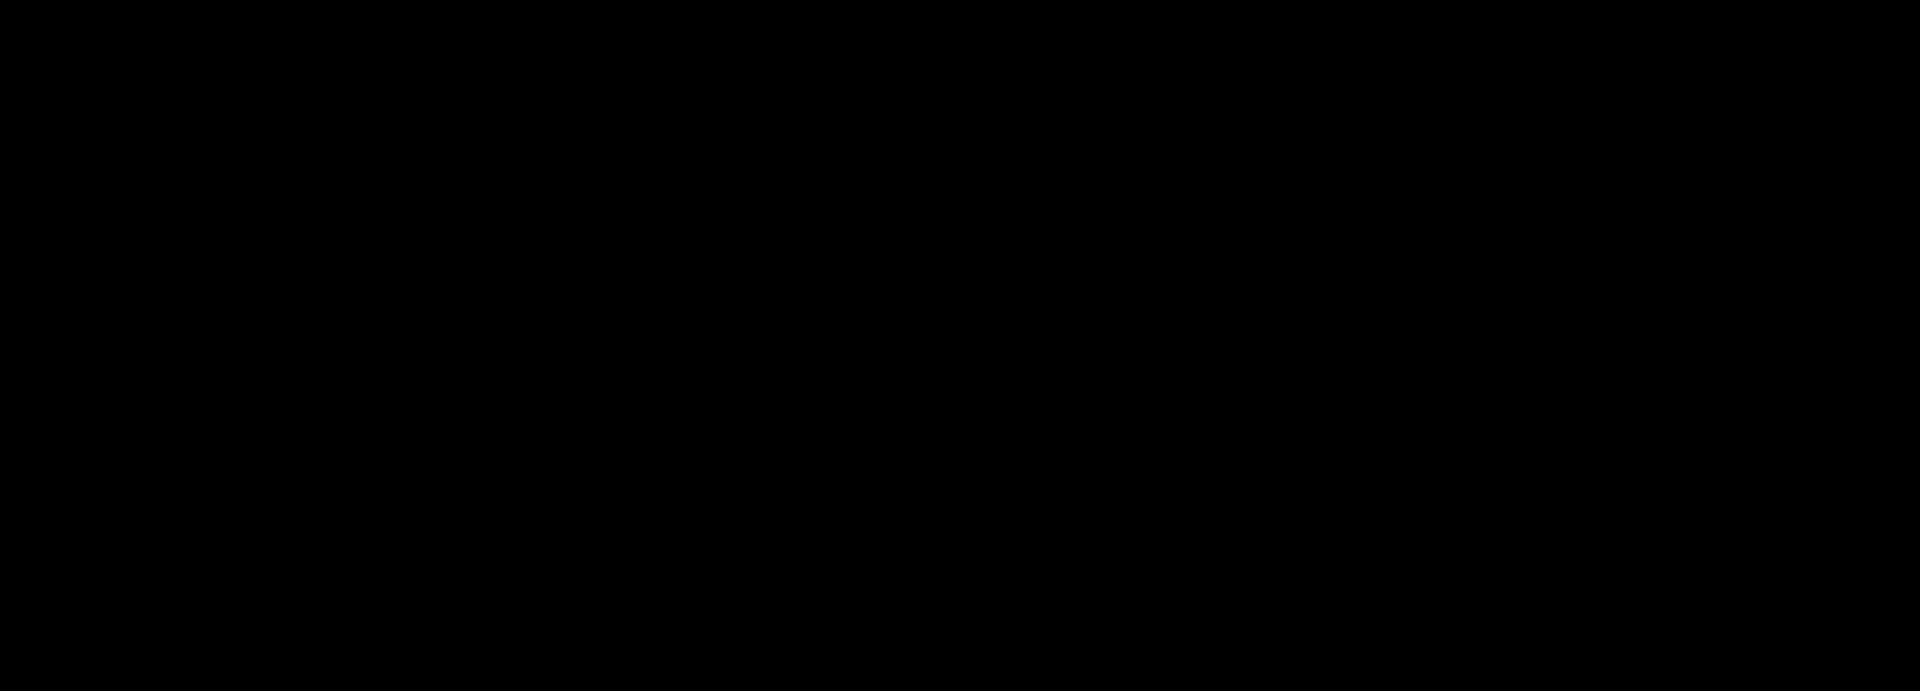 Pin De Clauu En Marcas Logos De Marcas Famosas Logotipos De Marcas Deportivas Logos De Marcas